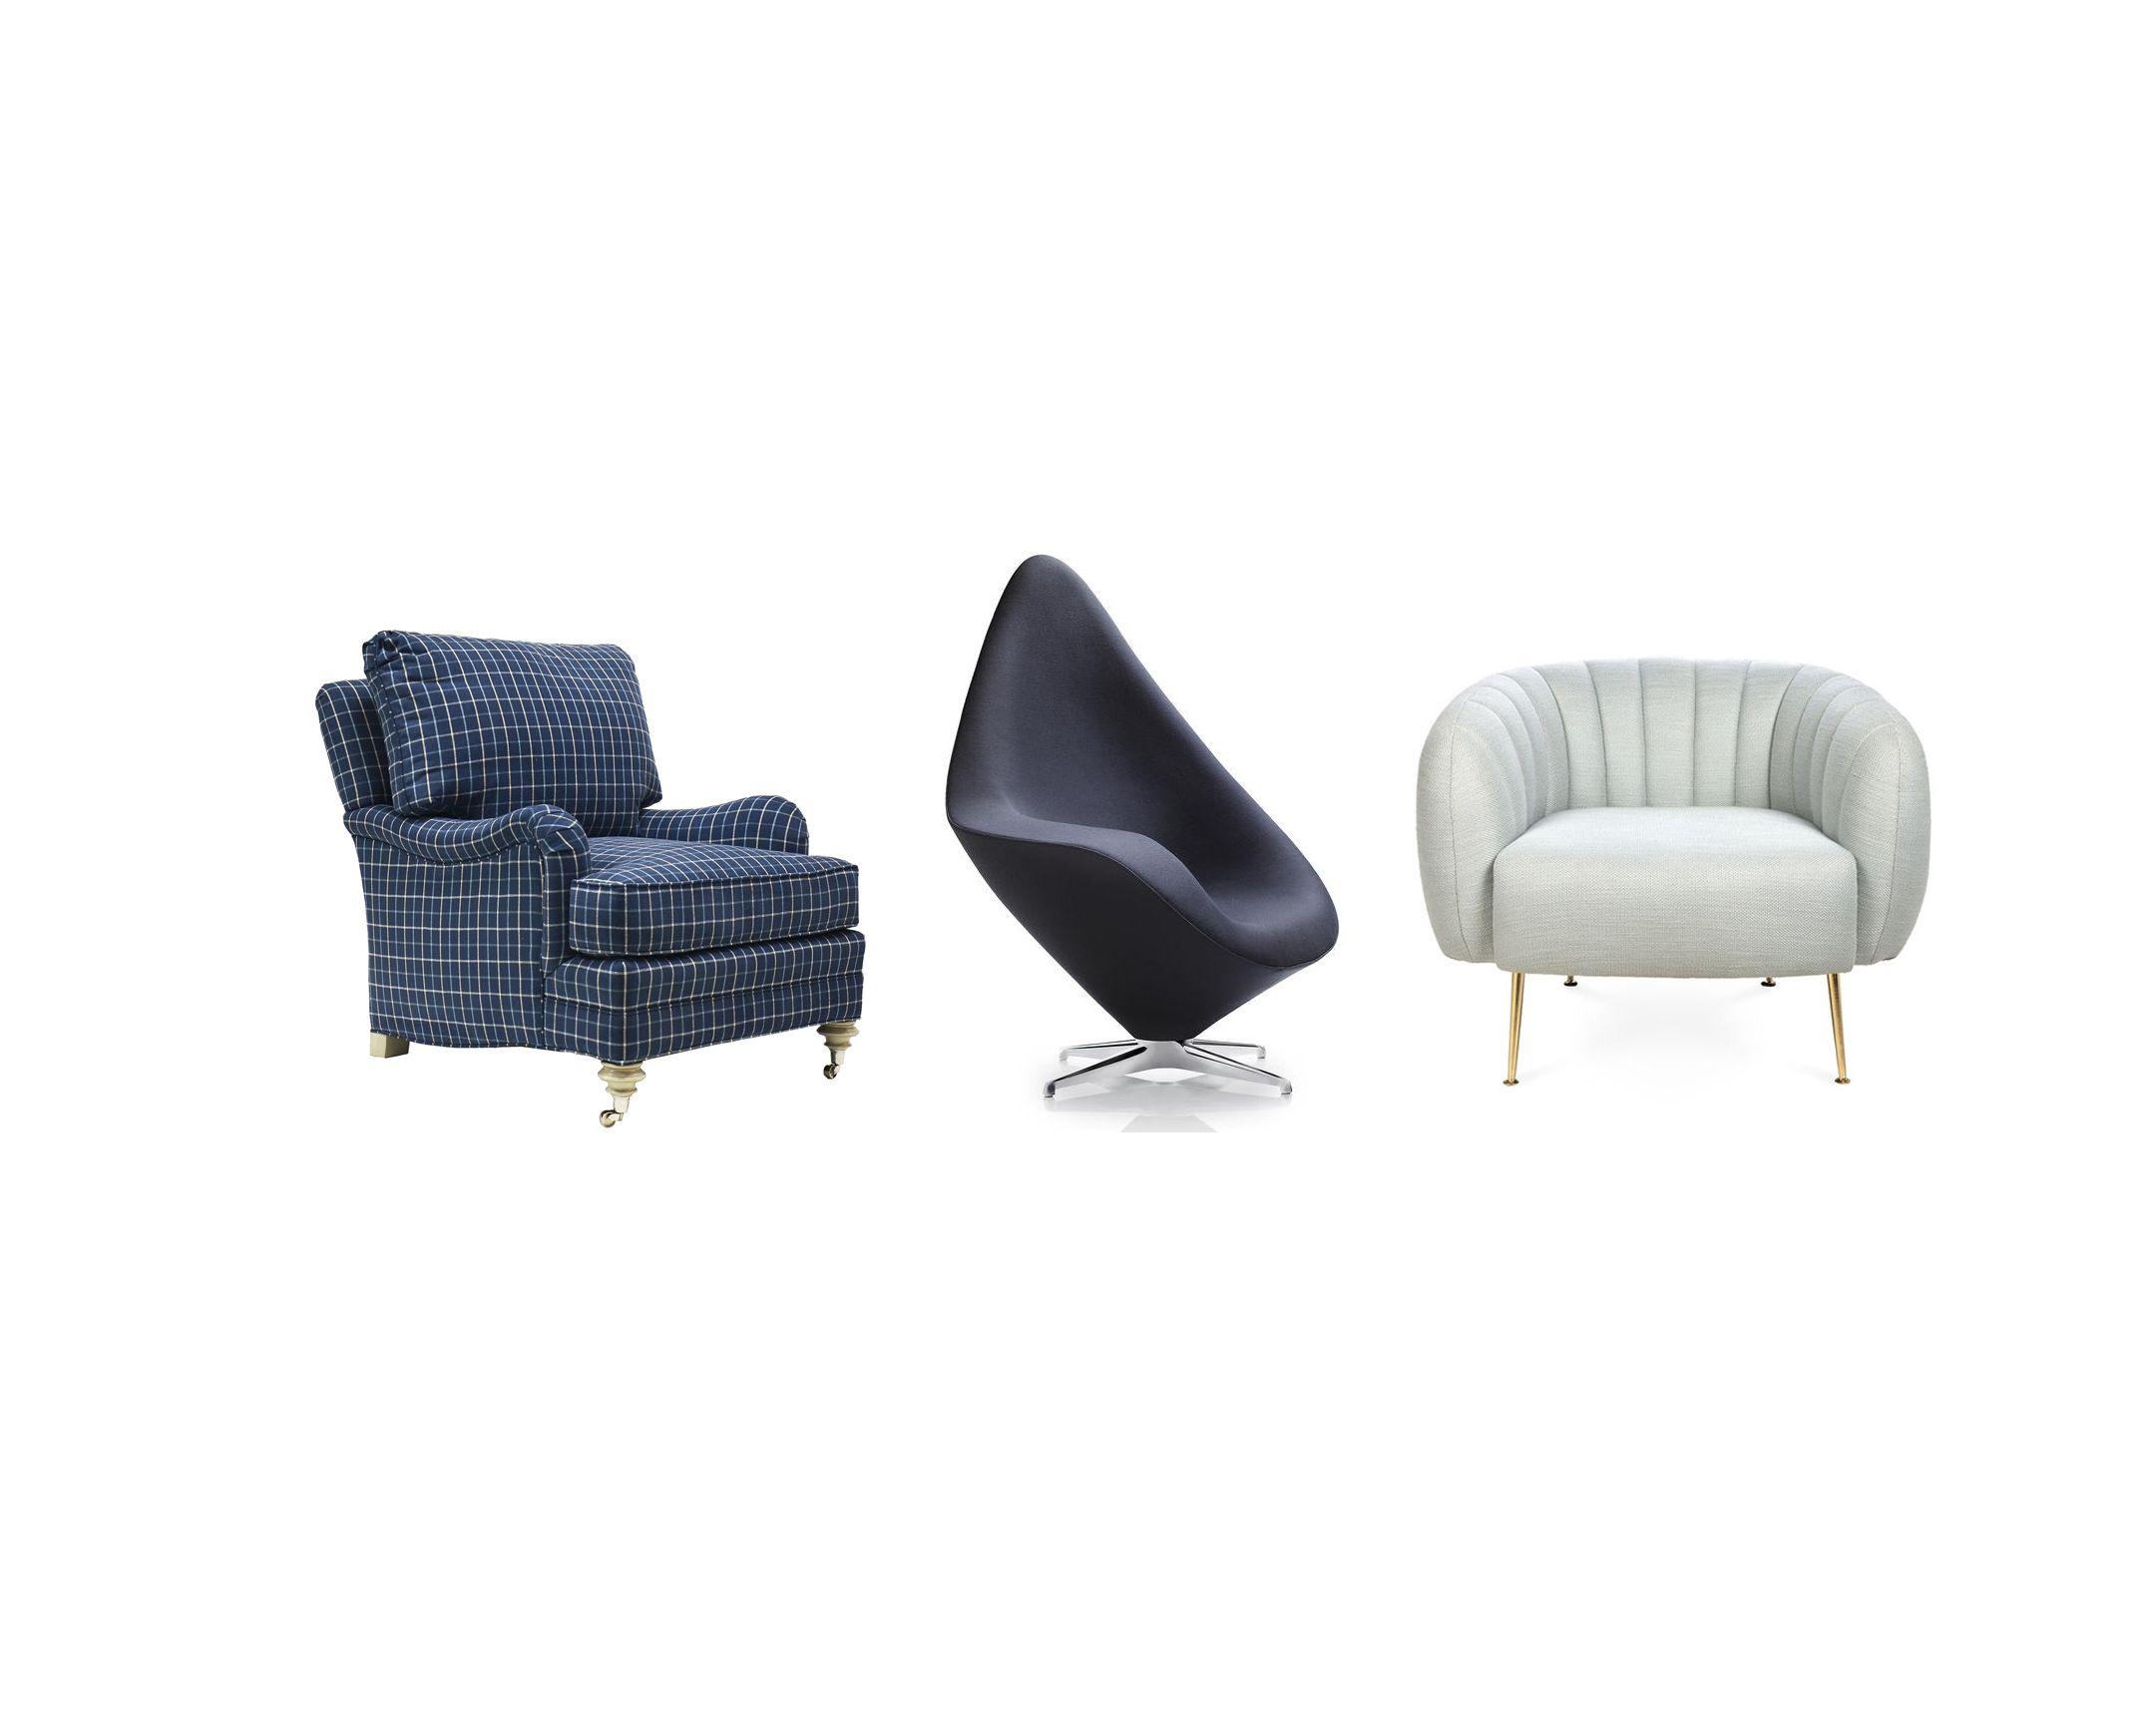 design chairs woodley recliner furniture comfort comforter britz s by